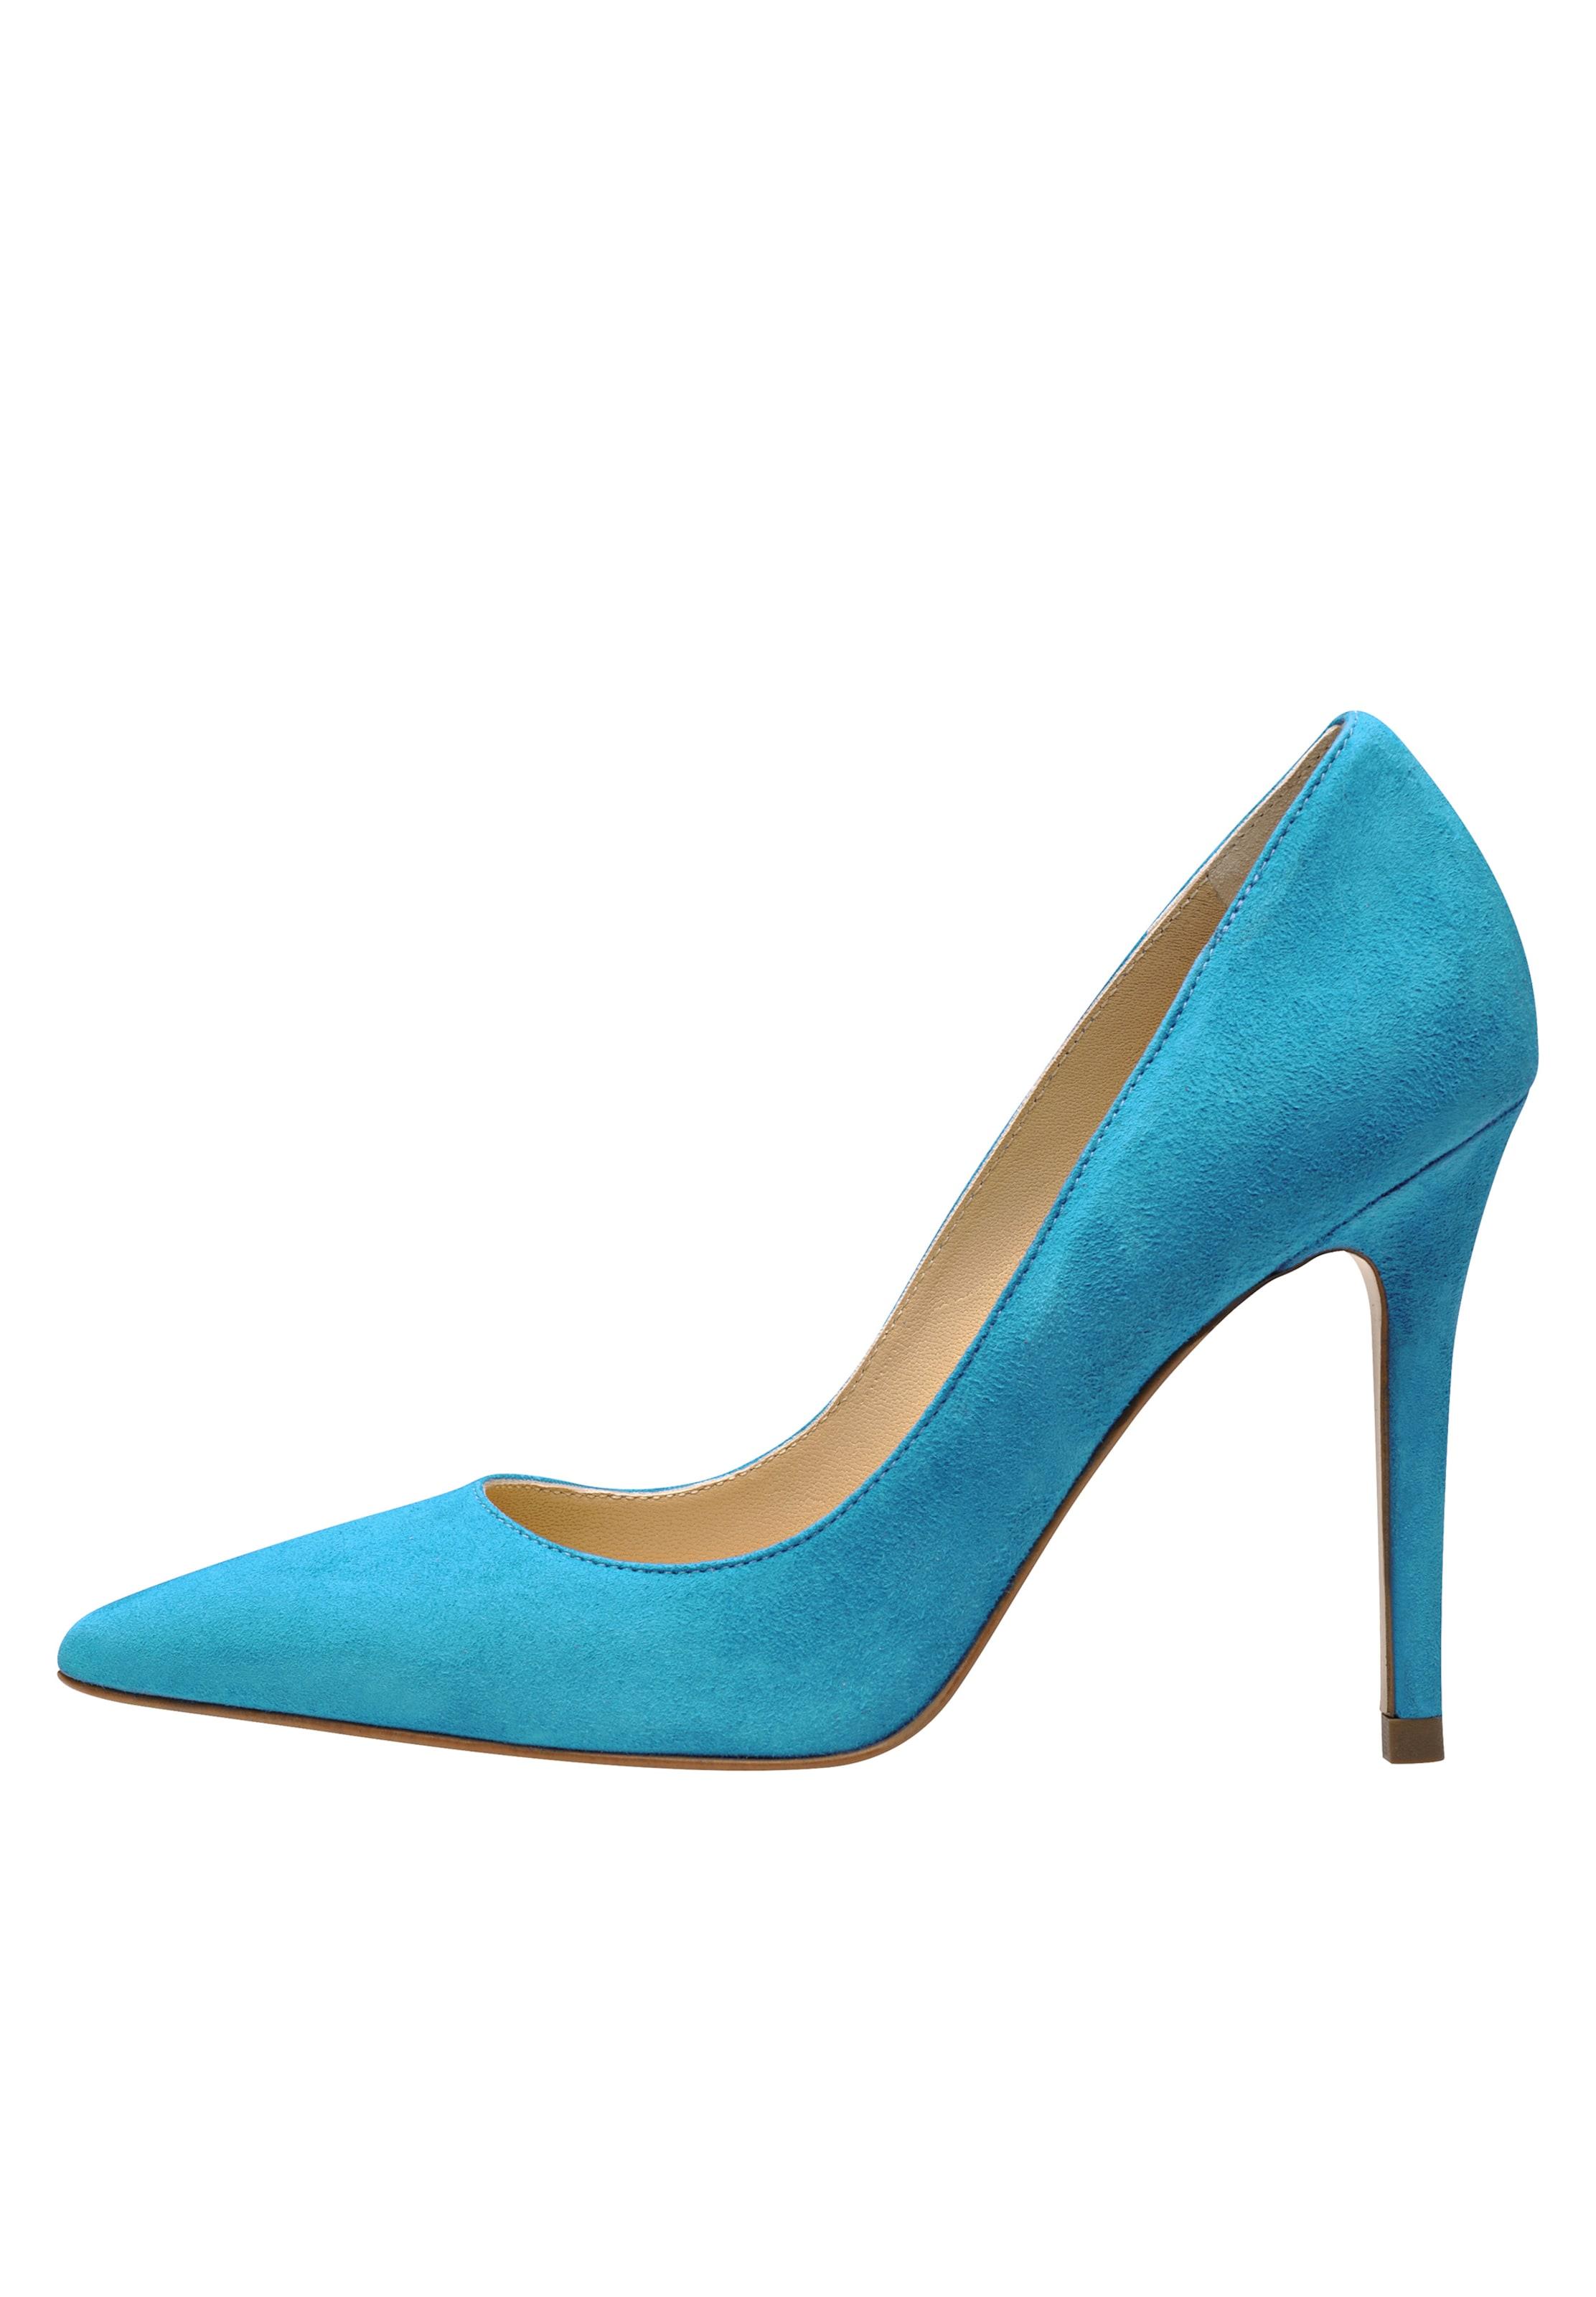 Bleu Bleu Evita En Evita En Escarpins Escarpins Evita 9HeED2IWY